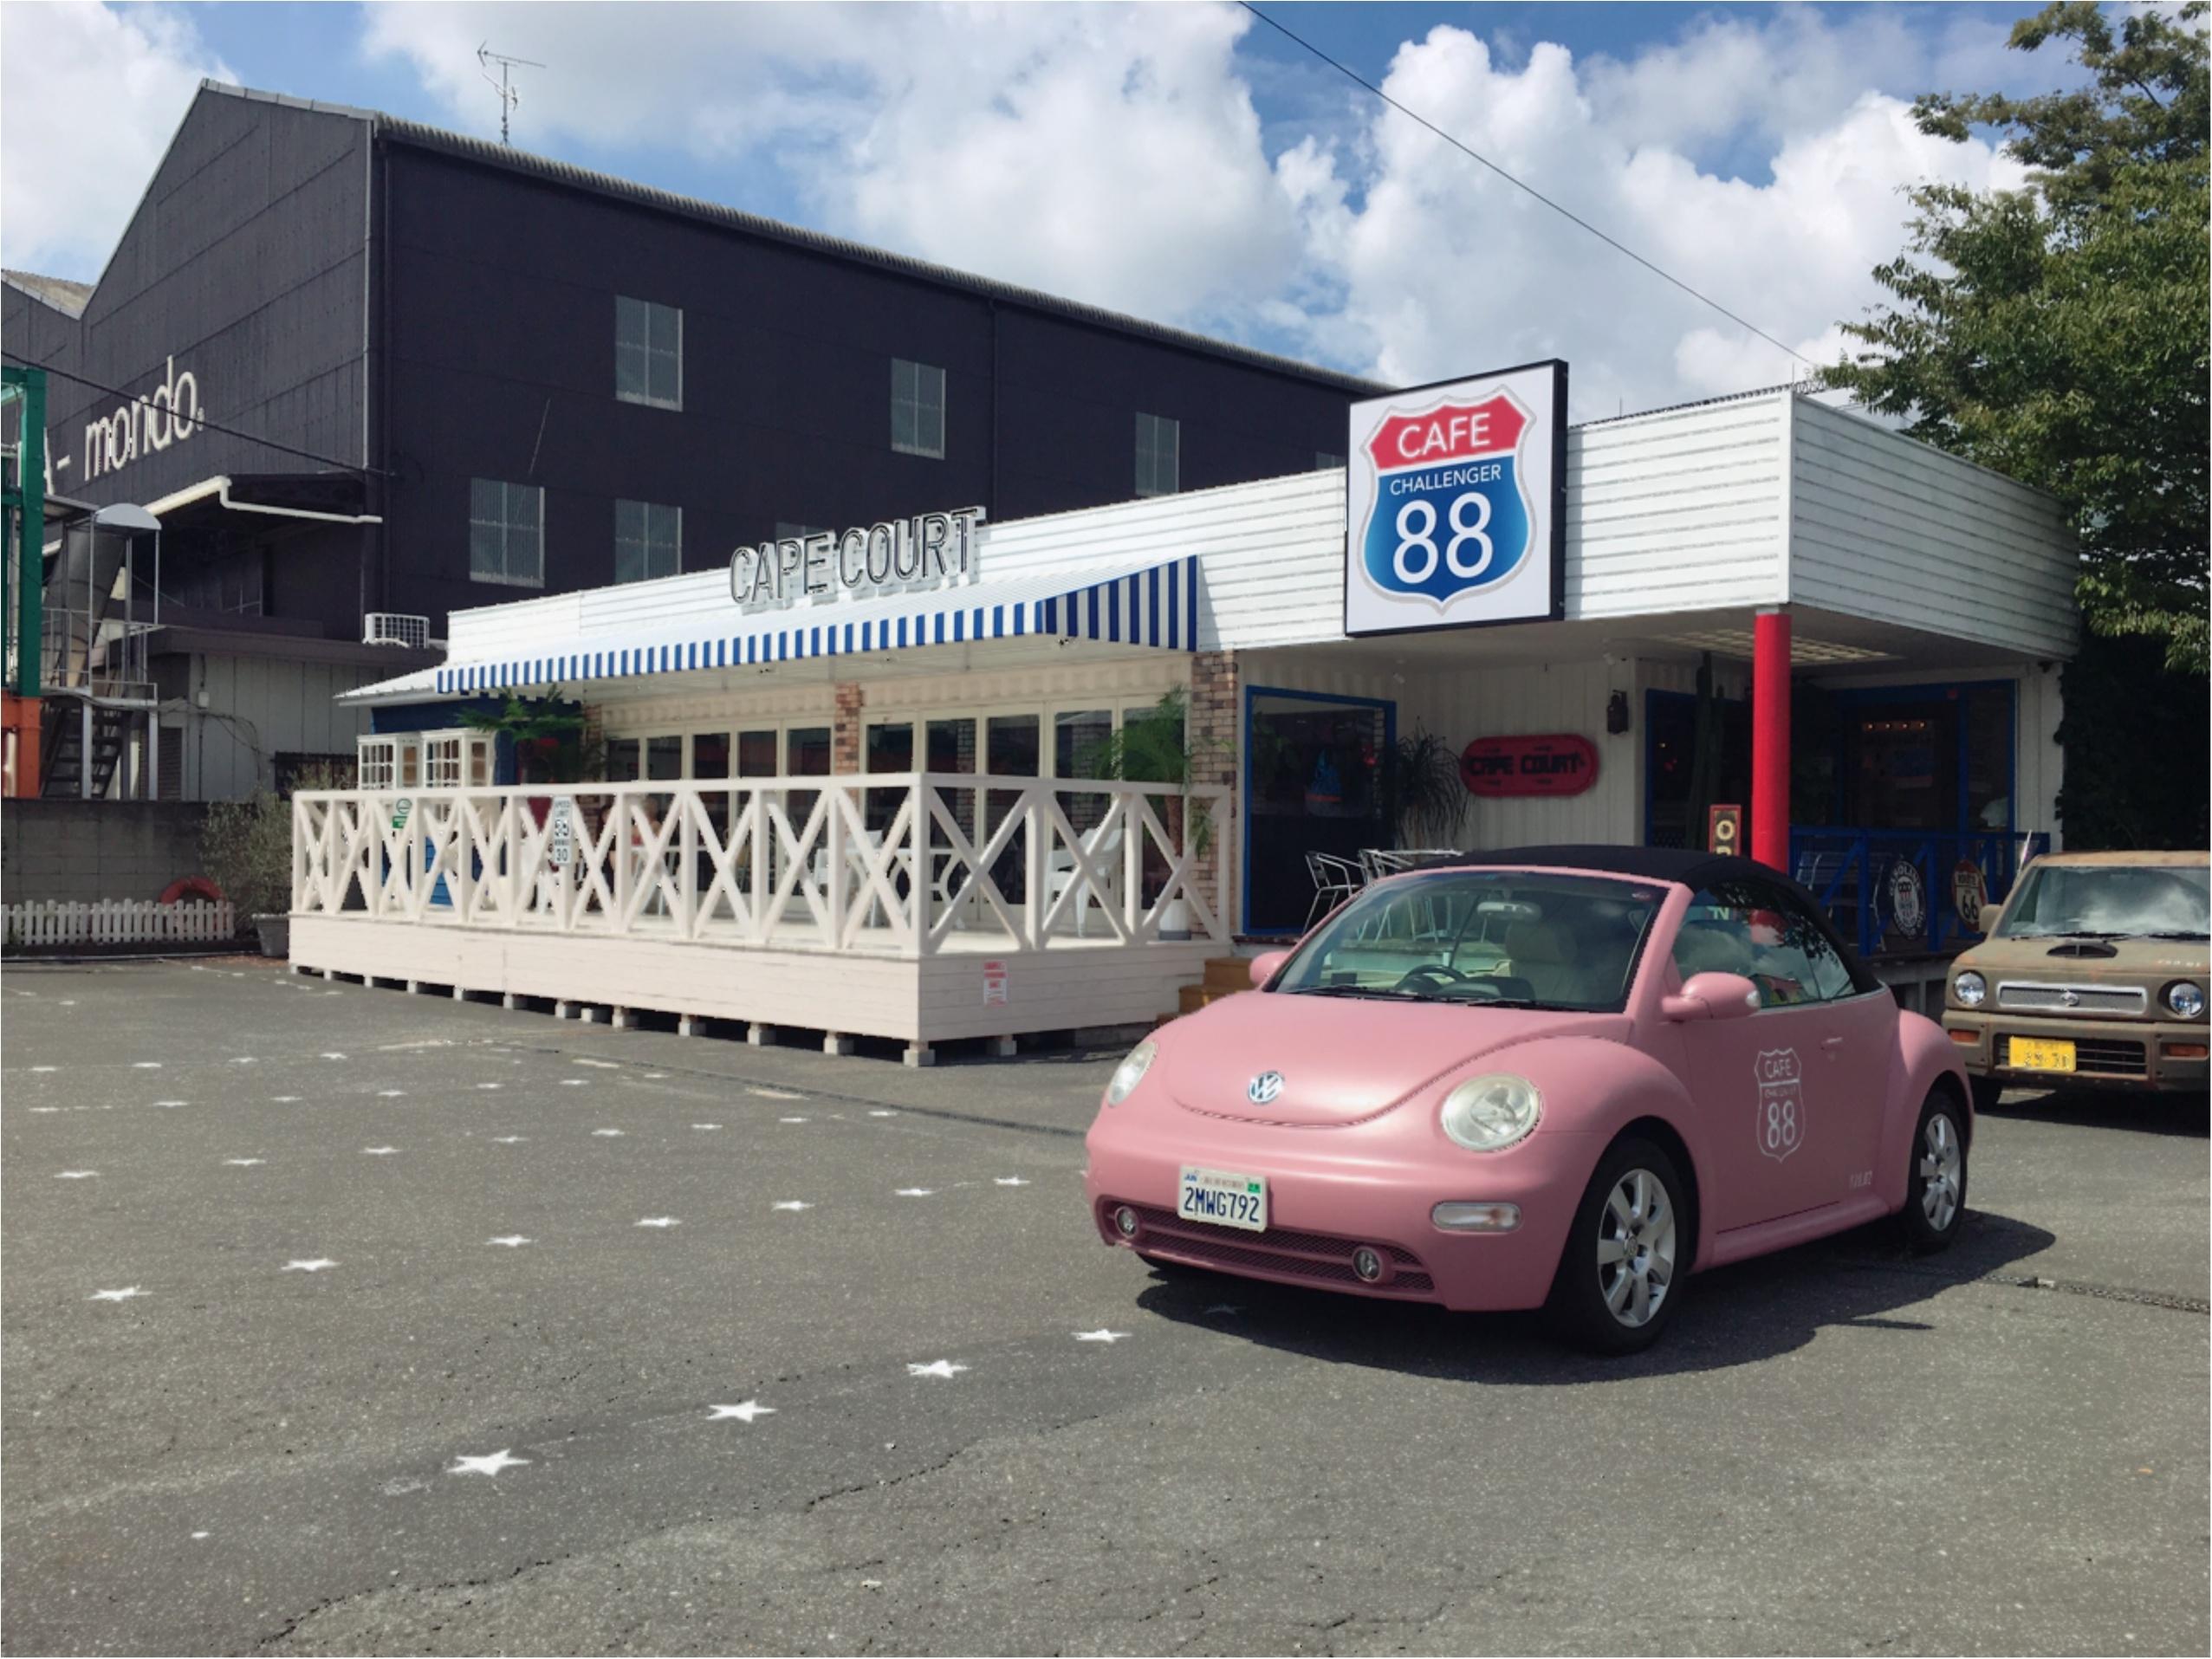 PINK!車がフォトジェニック◎アメリカンカフェ♡♡_2